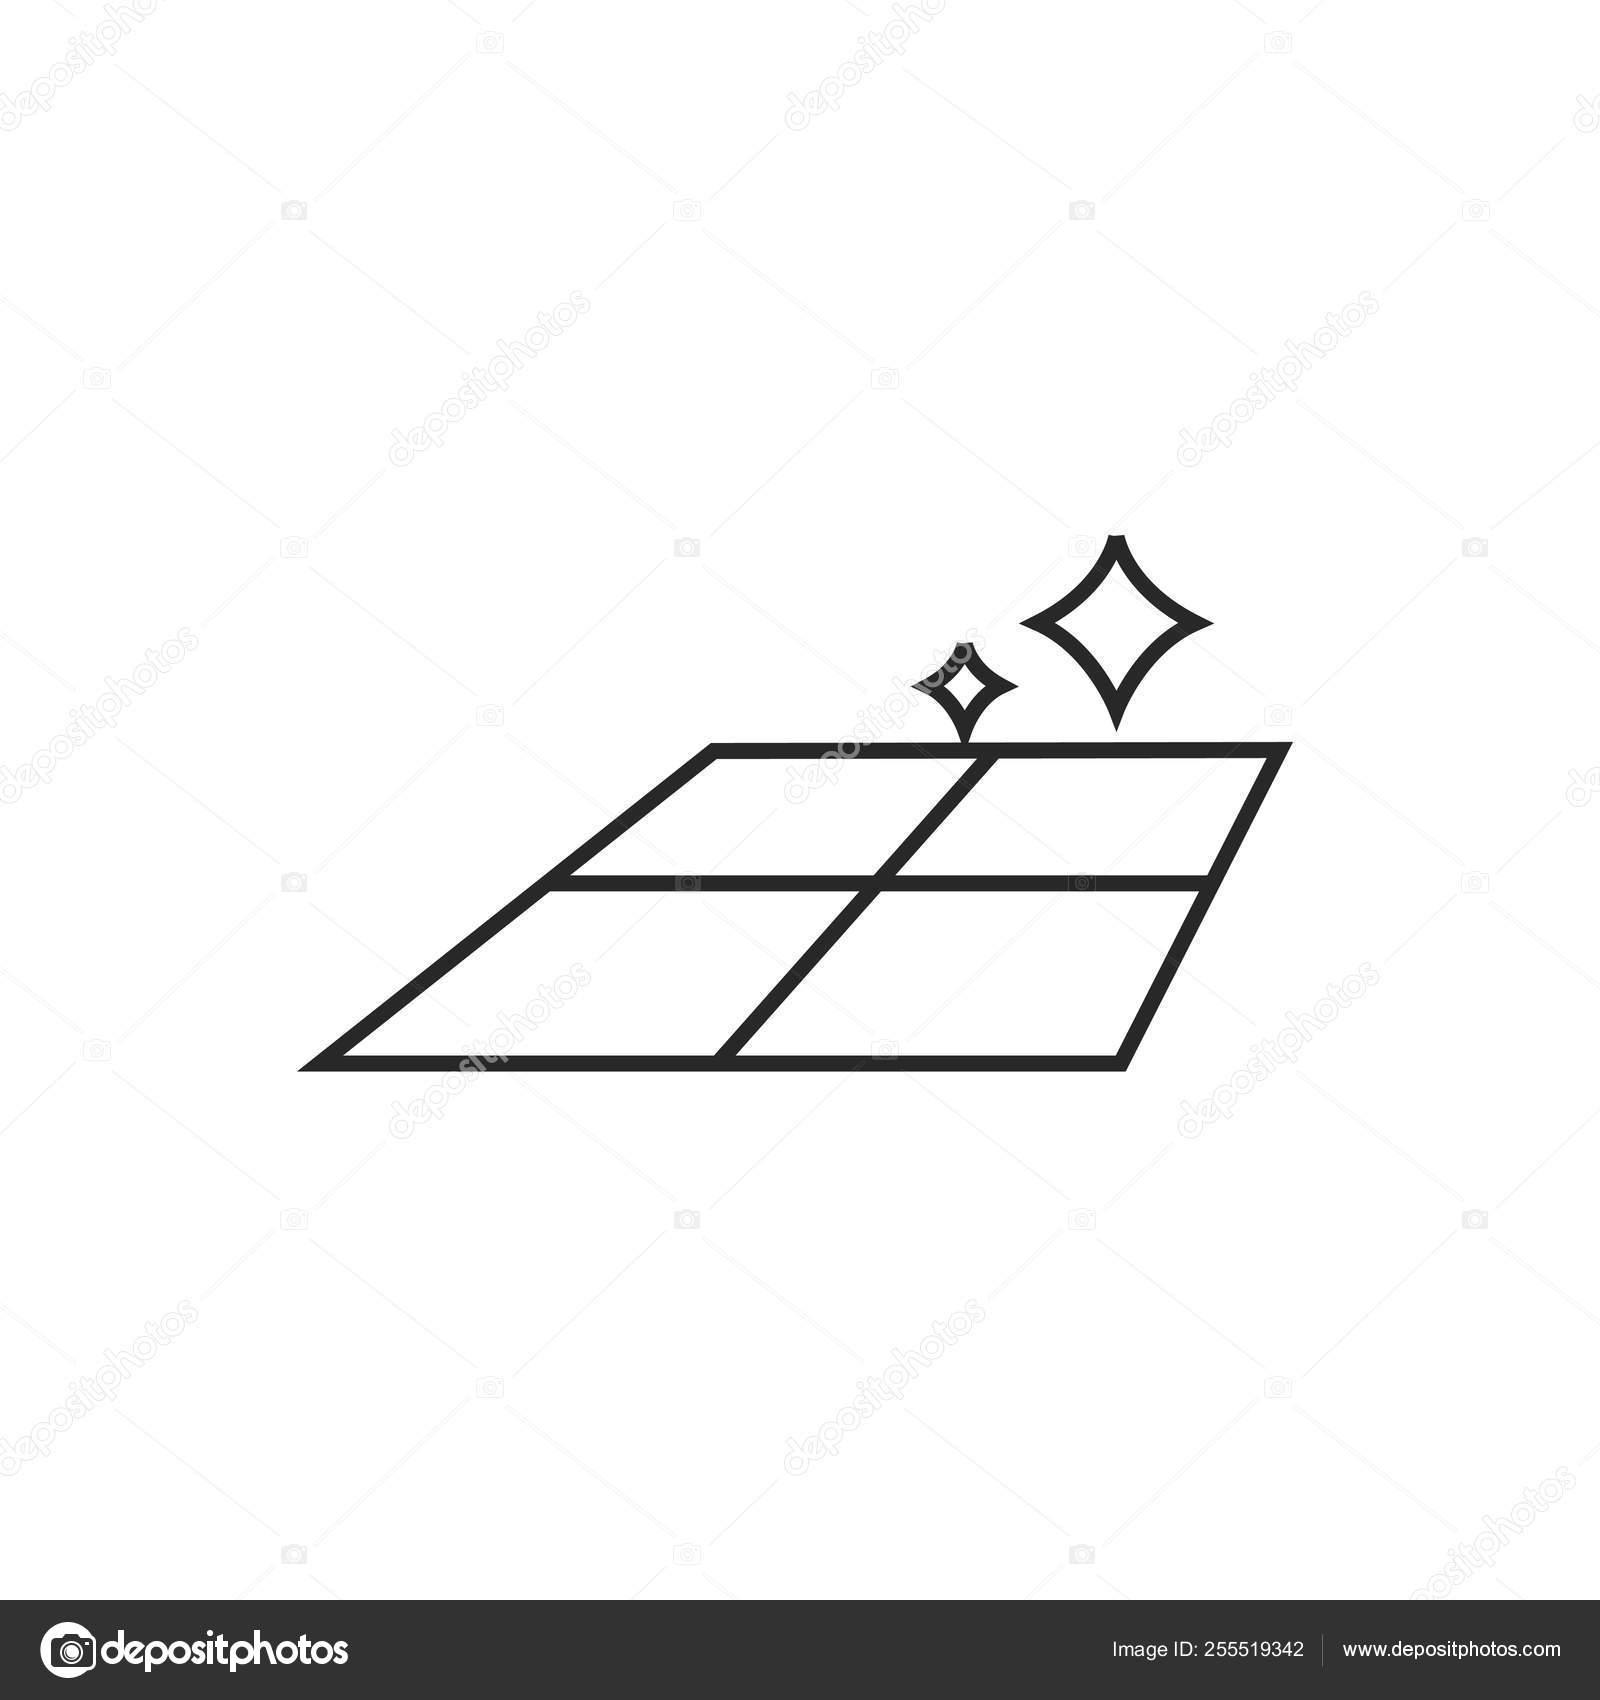 hight resolution of ceramic tile illustration tiled floor vector outline icon stock illustration